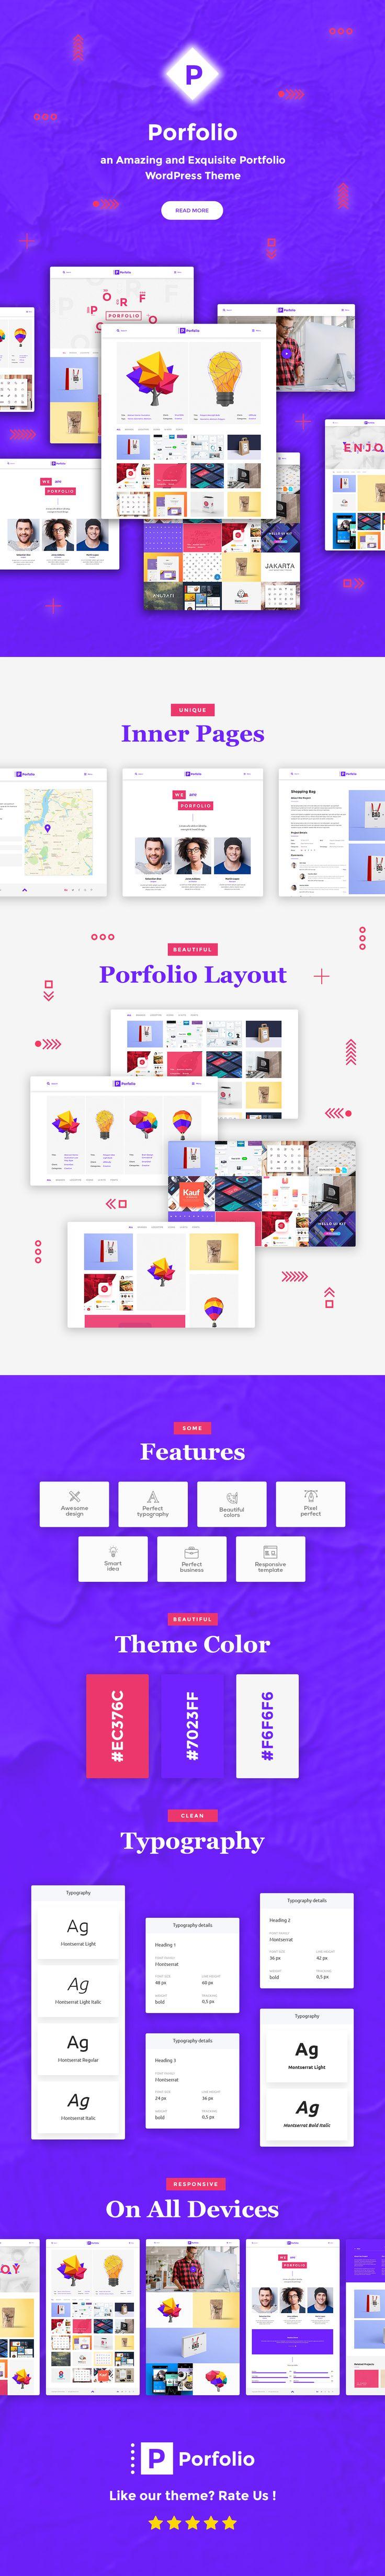 Porfolio - Creative Agency & Personal Portfolio WordPress Theme by modeltheme